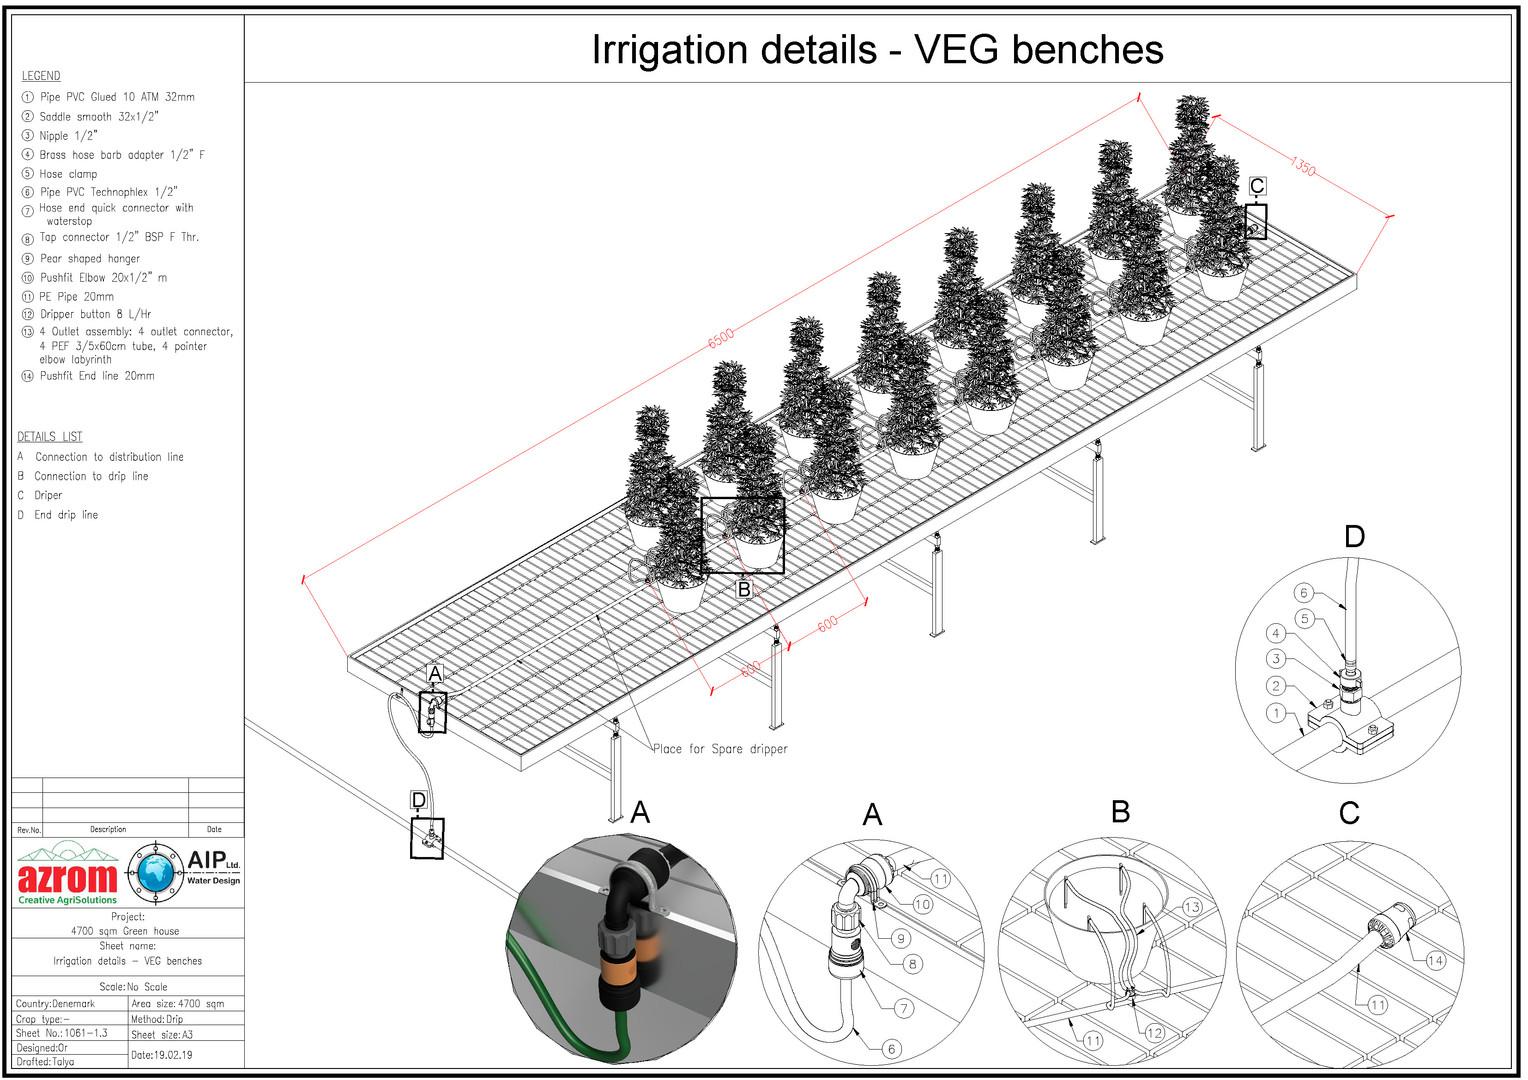 1061-1.3 Irrigation details - VEG benche